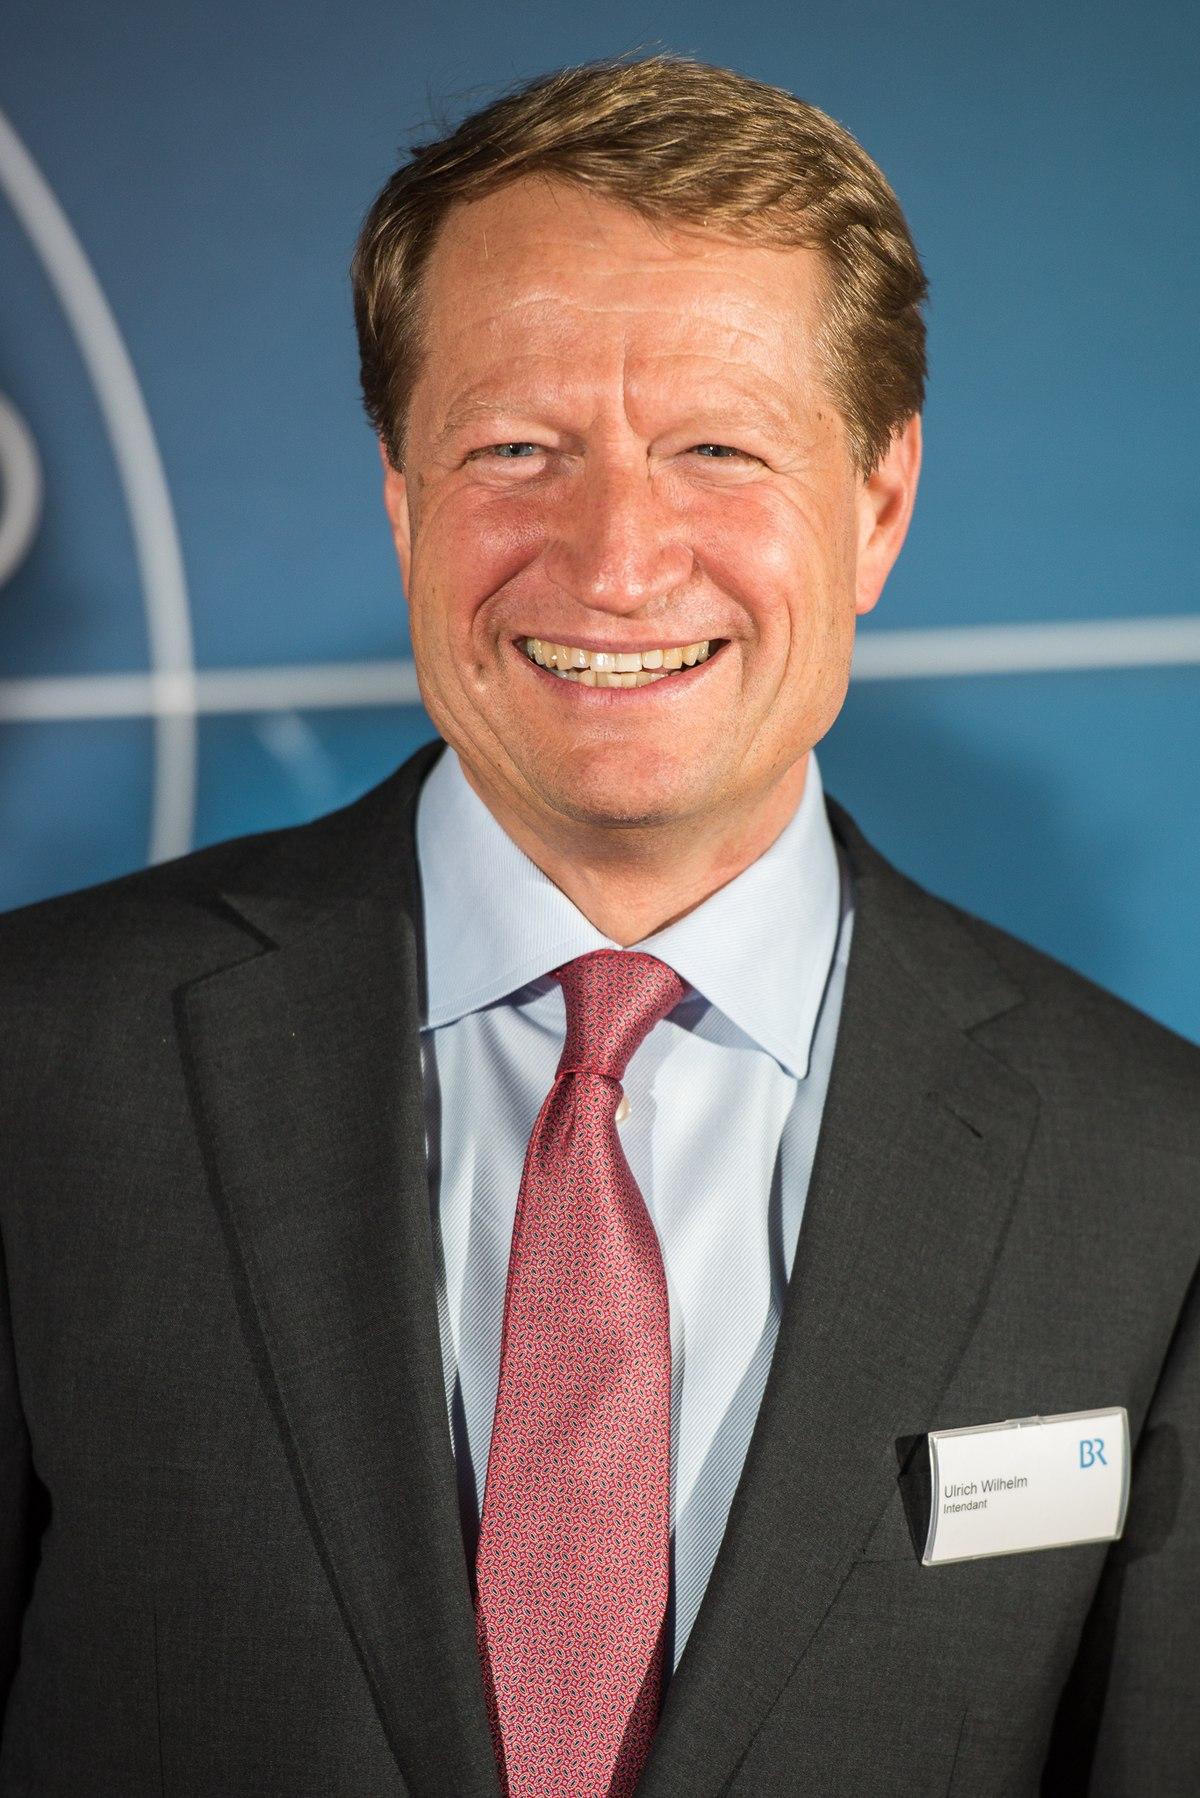 Ulrich Wilhelm – Wikipedia